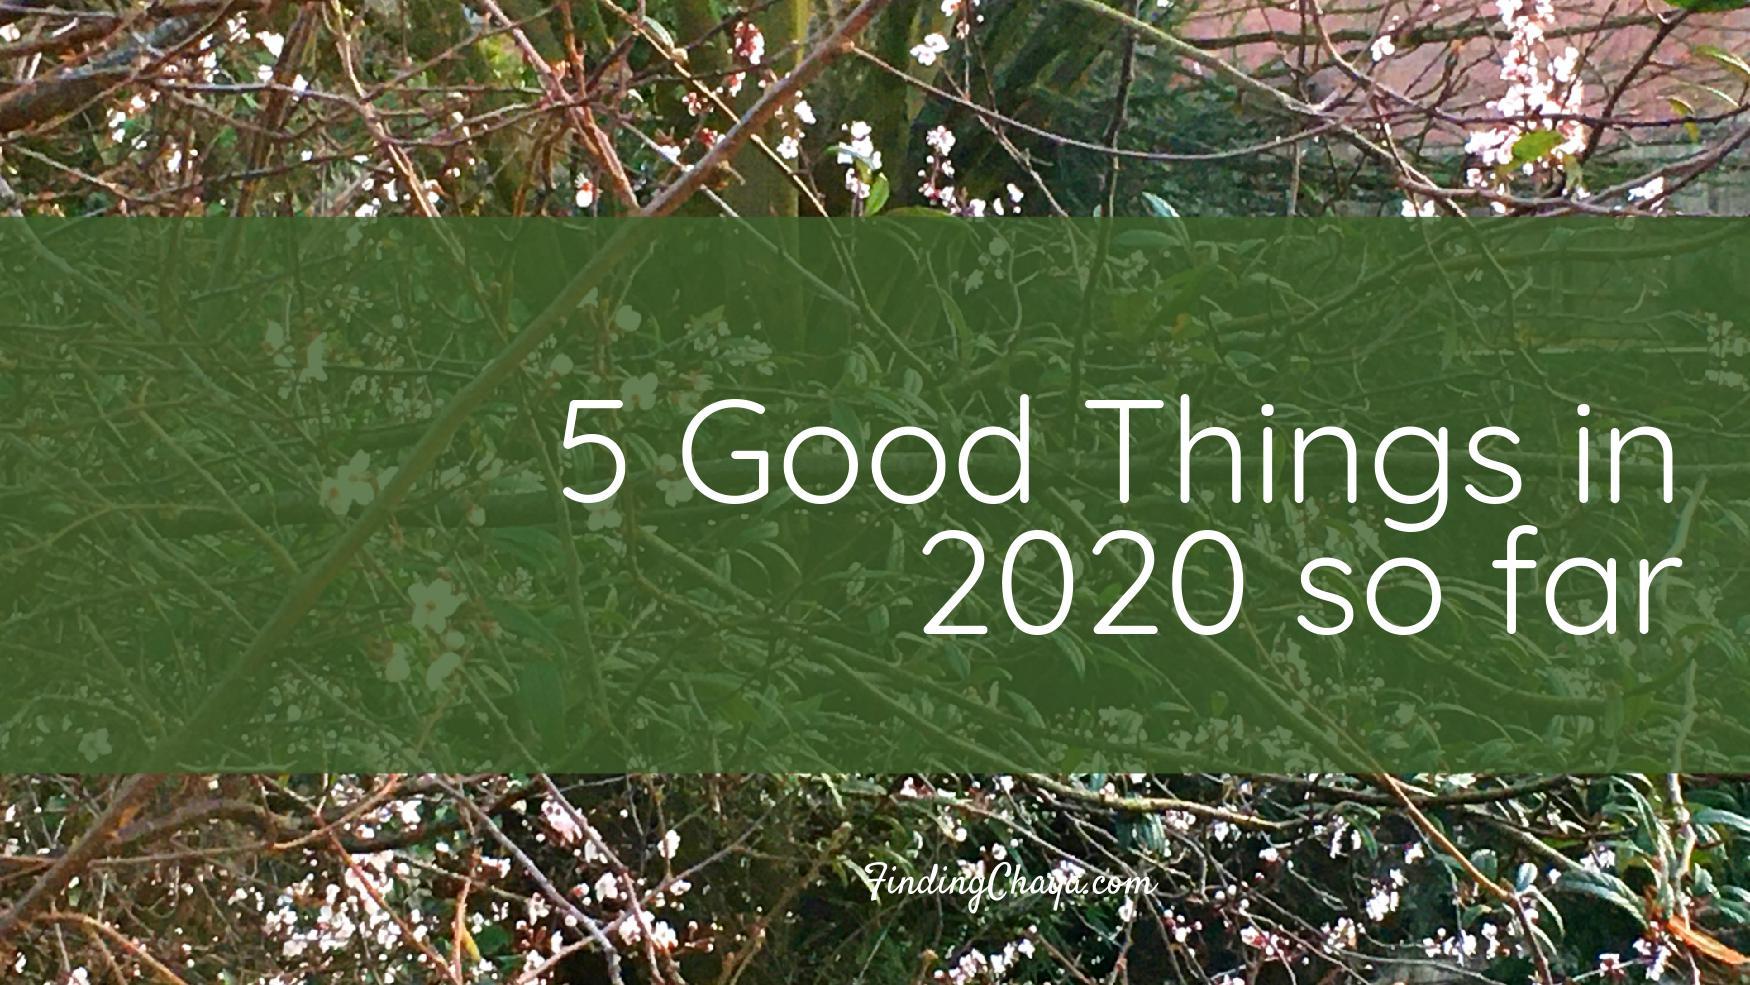 5 Good Things In 2020 So Far